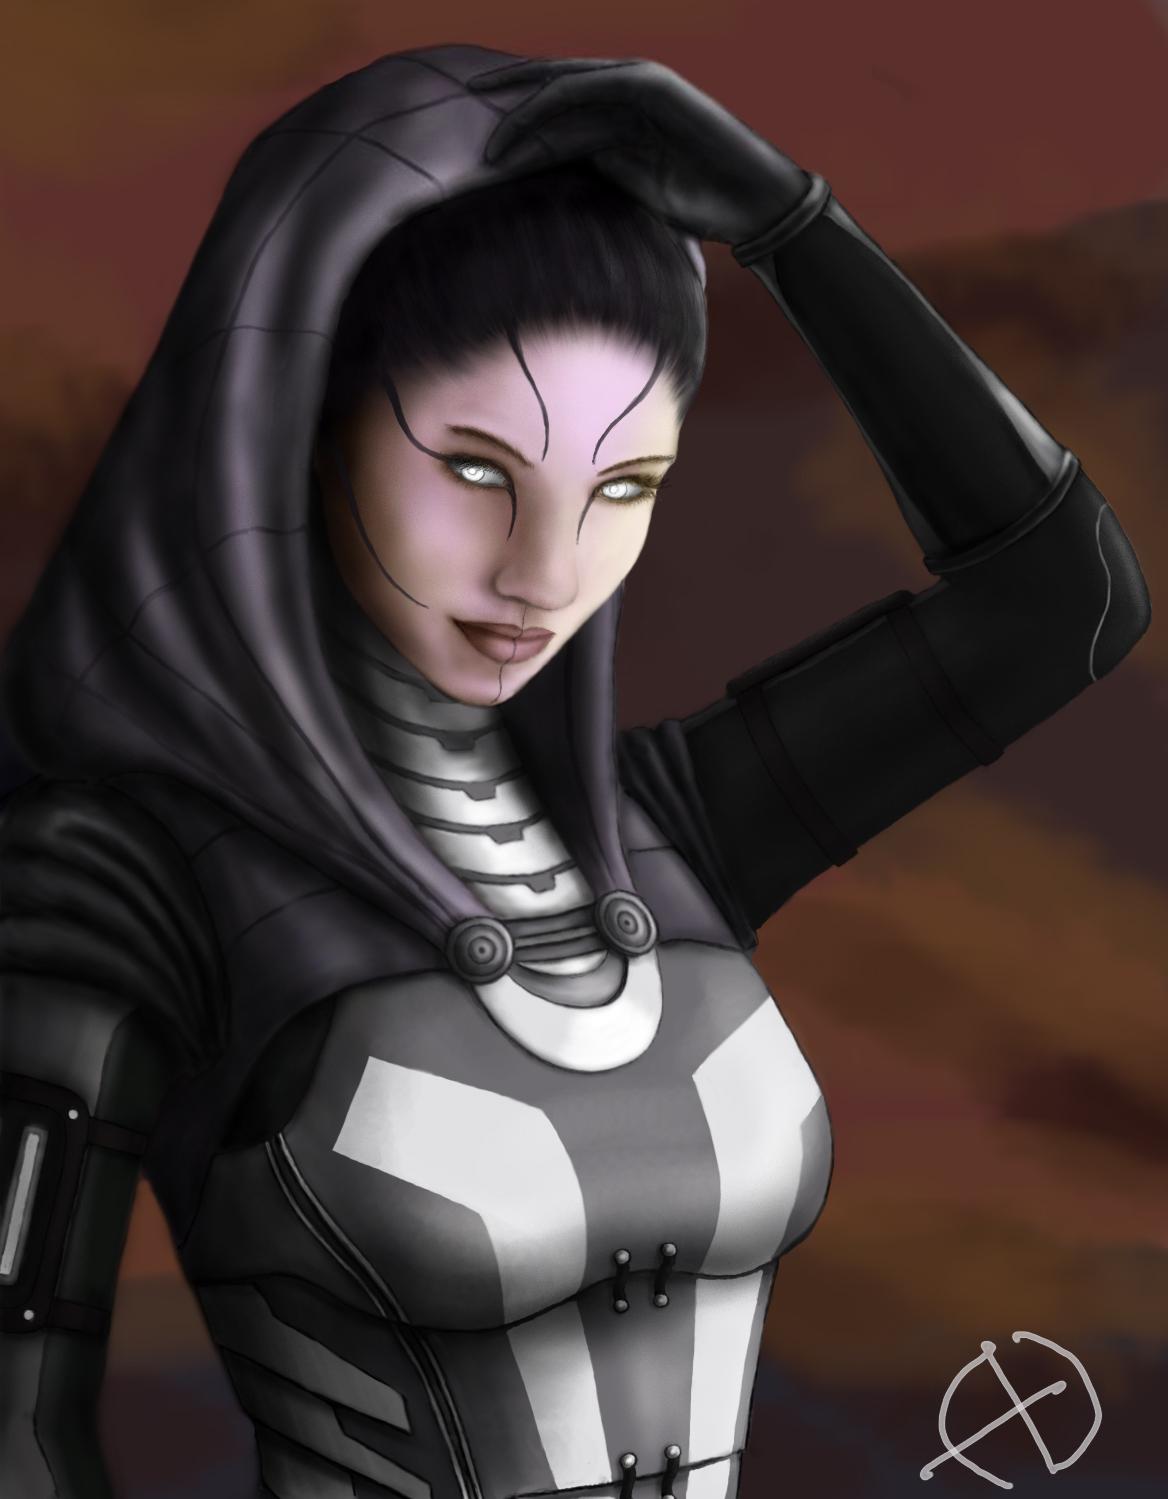 Mass Effect Tali Unmasked Tali'zorah by onelonemadman